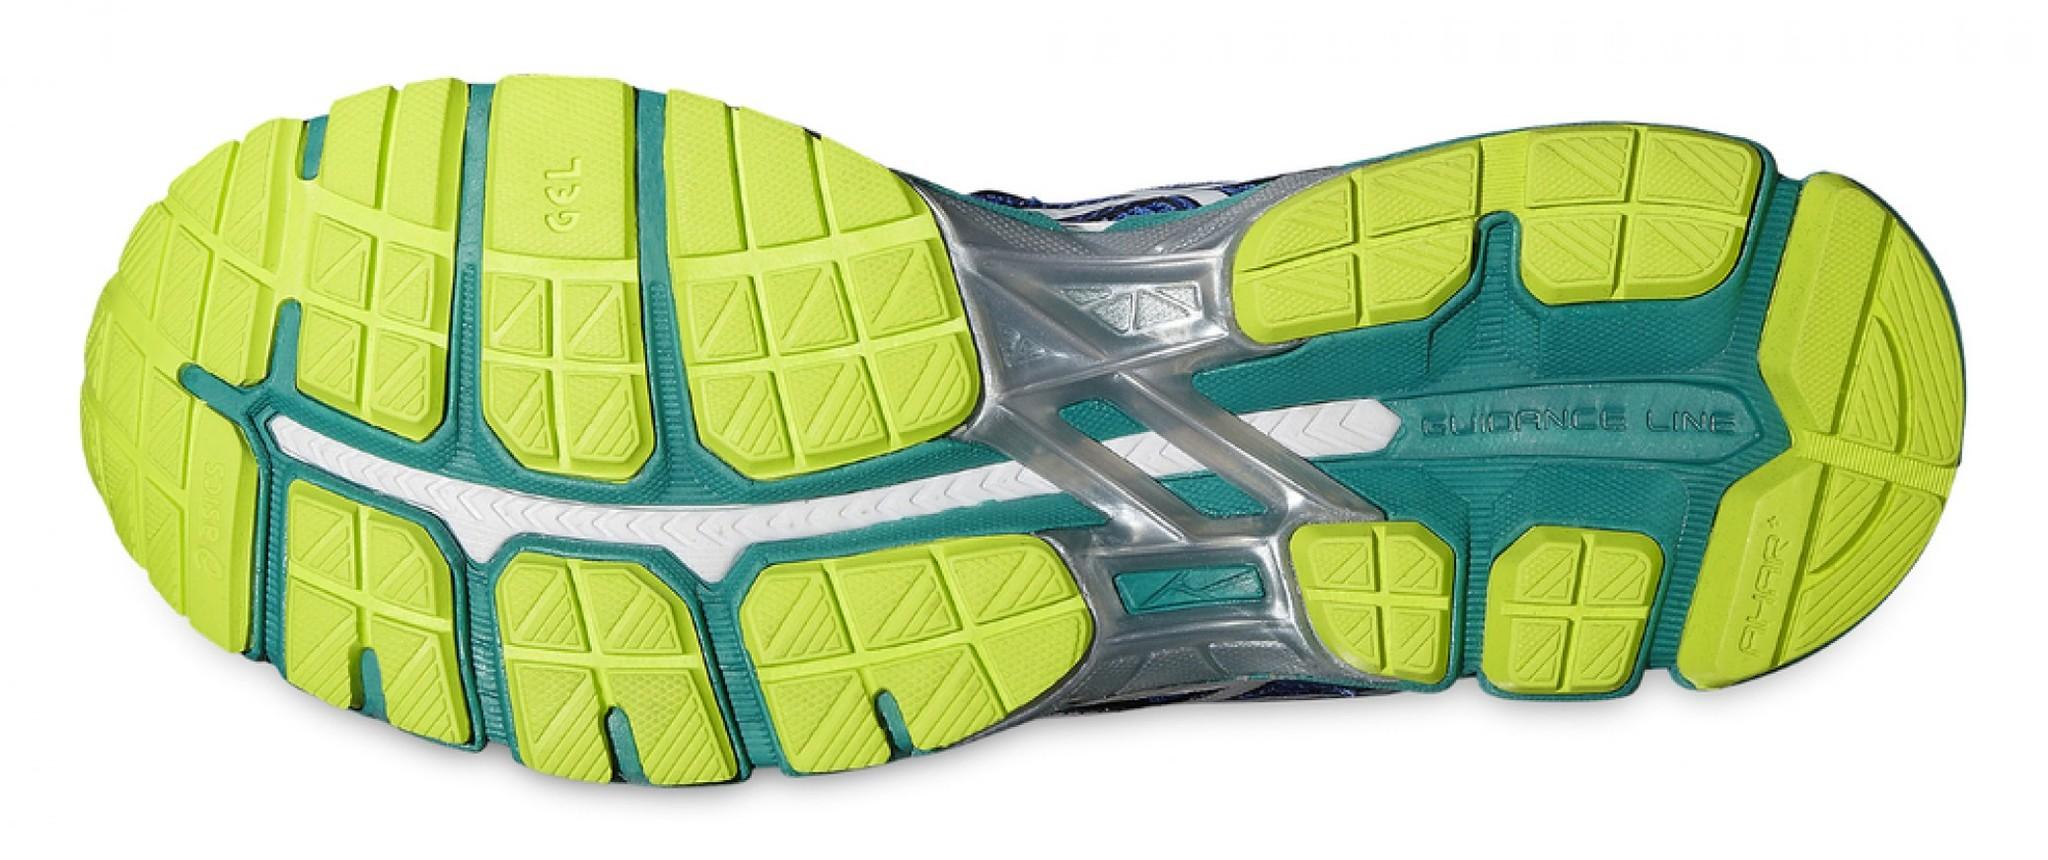 Кроссовки для бега Asics Gel-Kayano 21 мужские (T4H2N 4701)